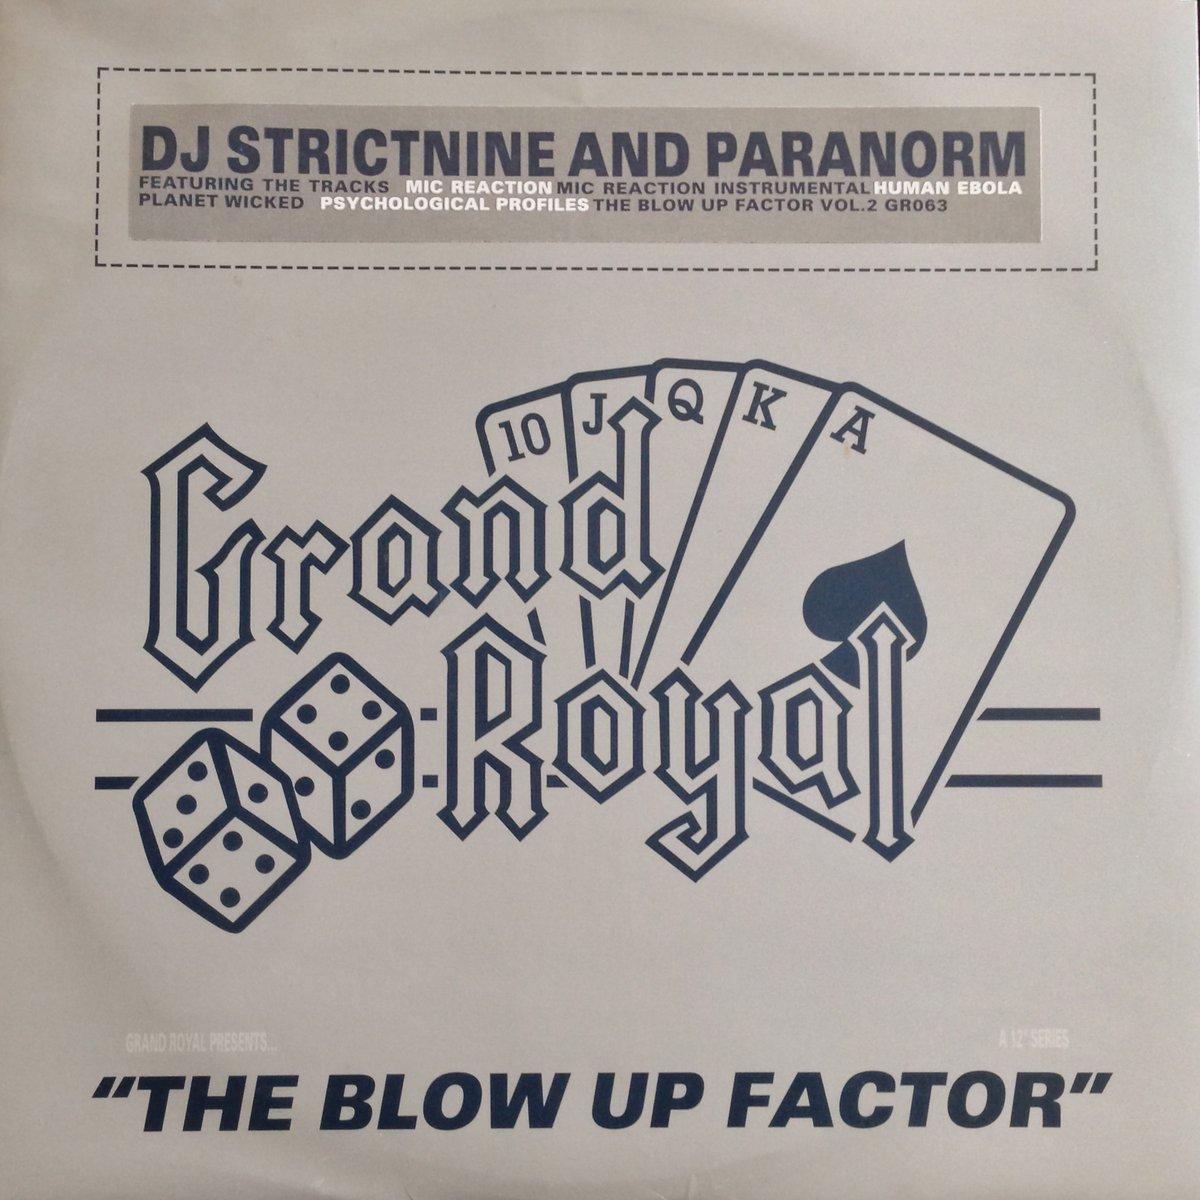 Dj Strictnine and Paranorm Mic Reaction Vinyl